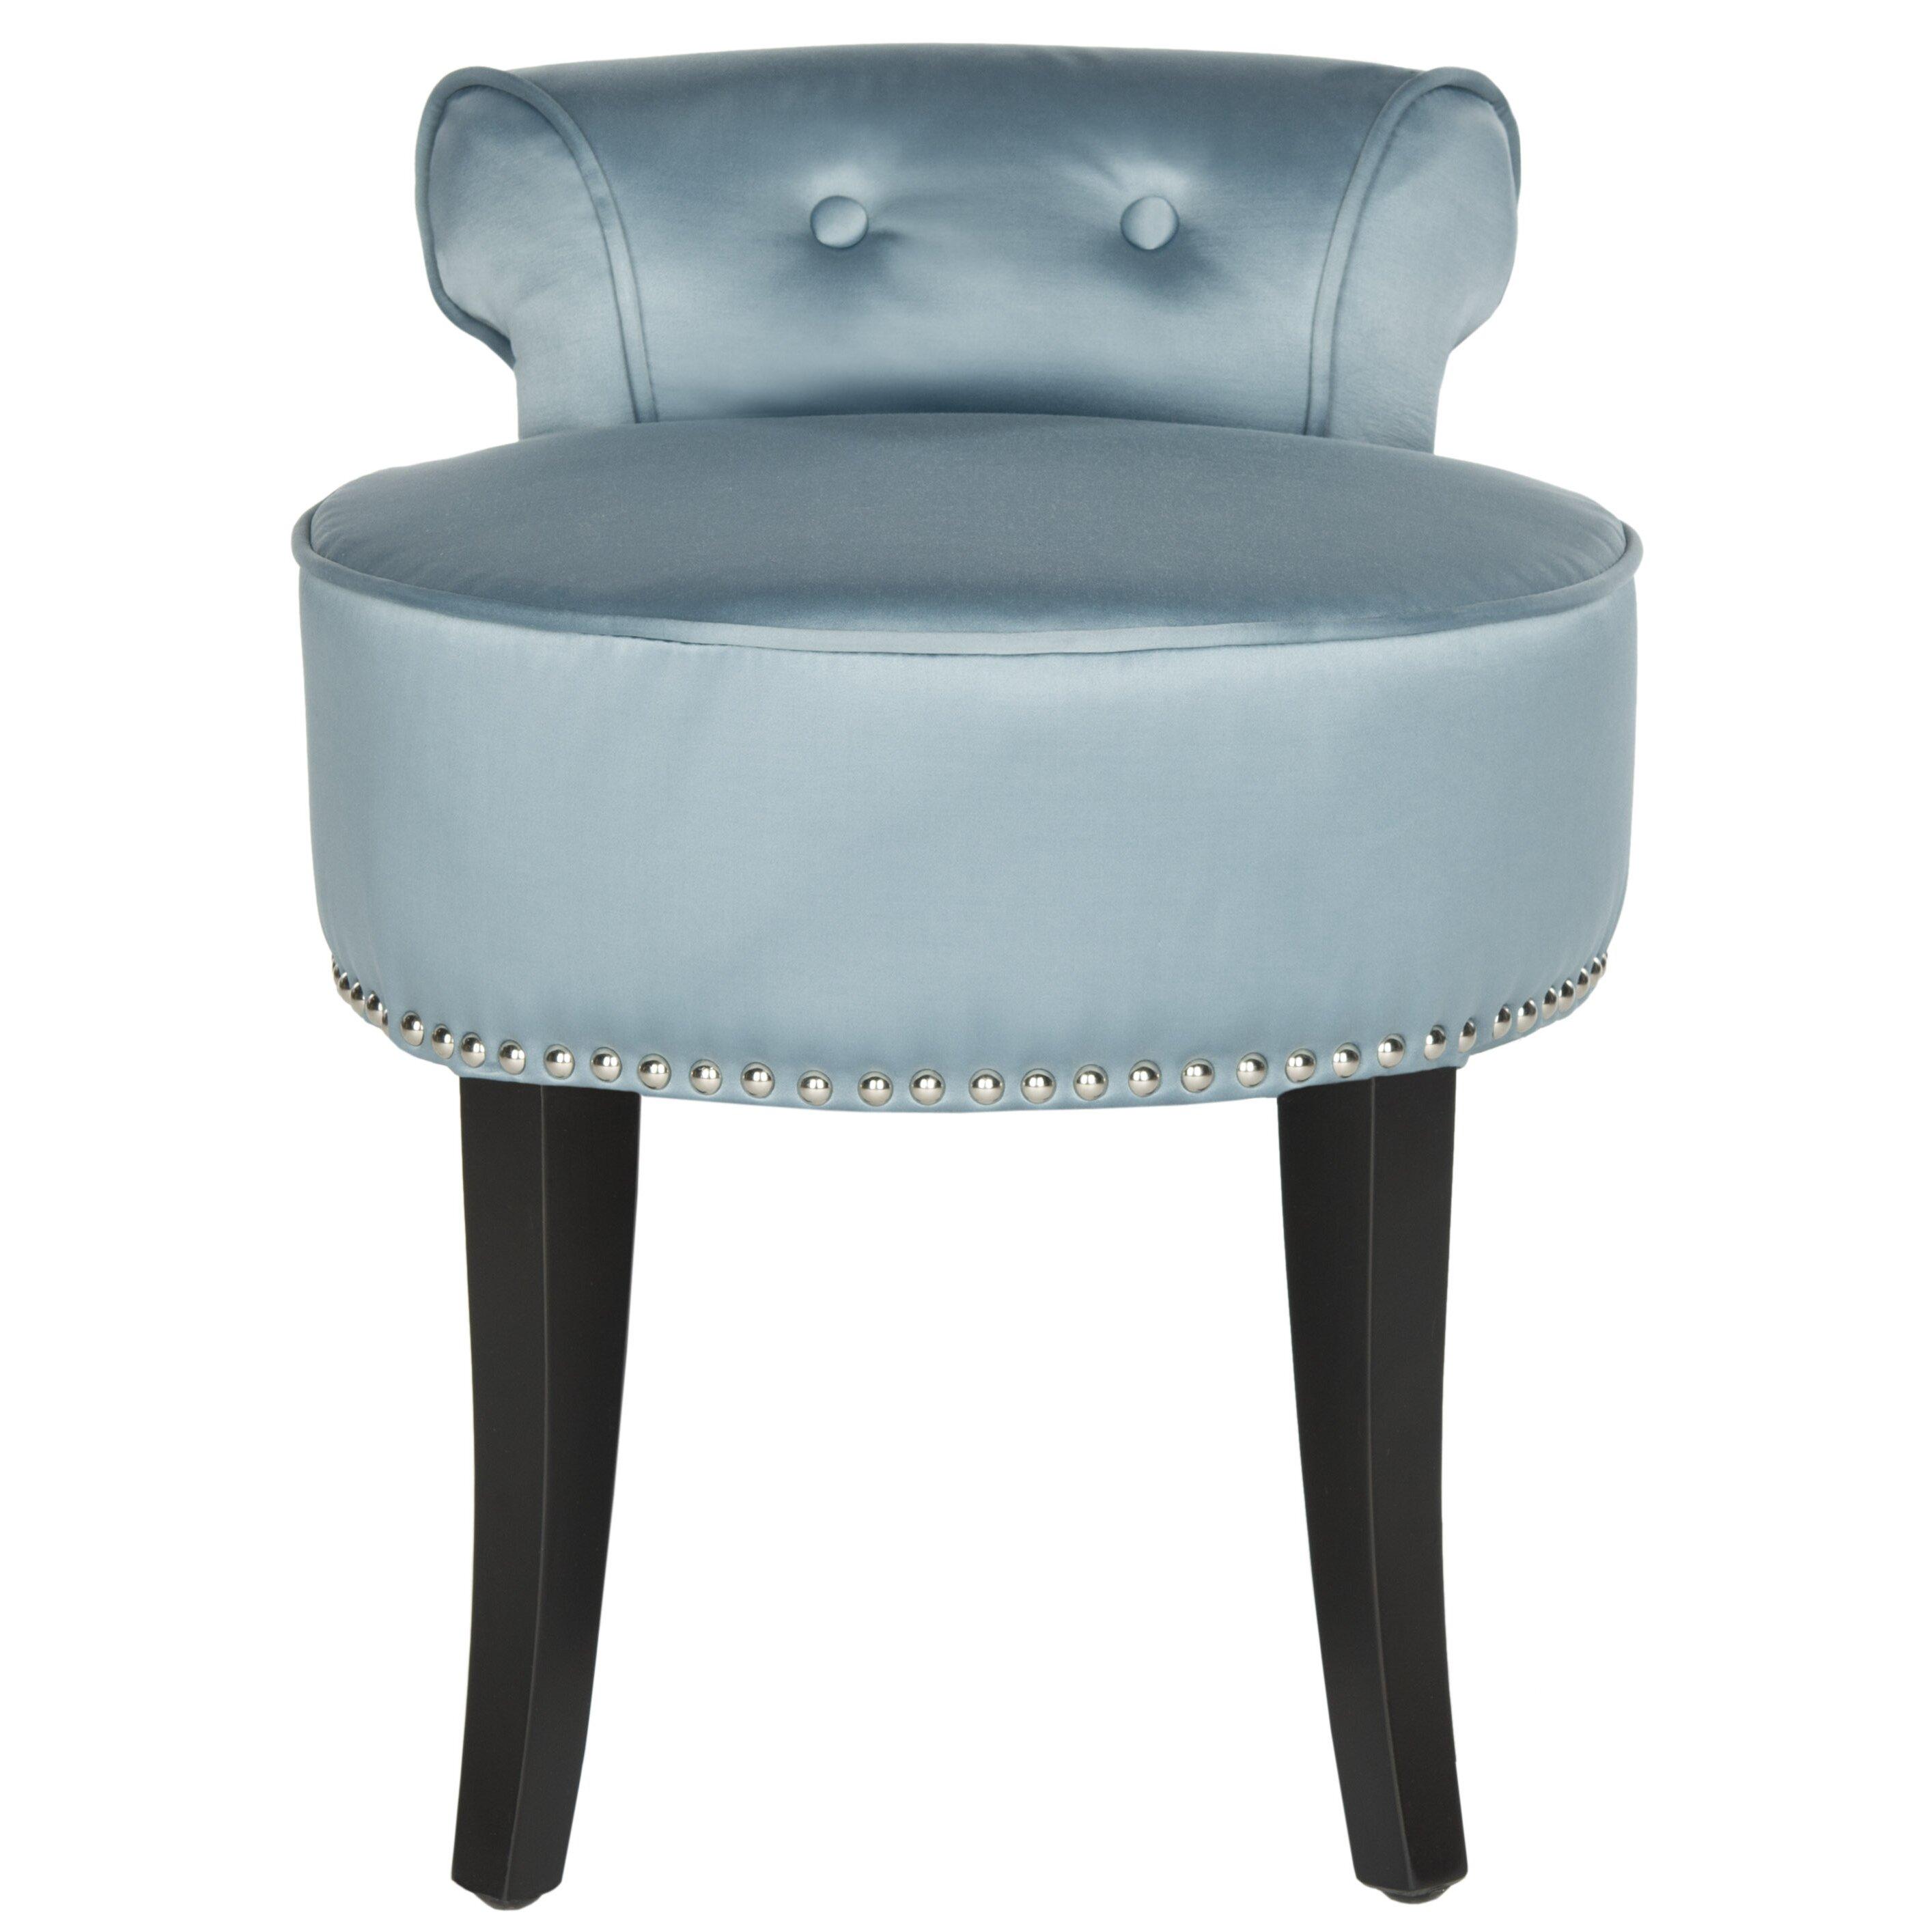 safavieh georgia vanity stool reviews wayfair. Black Bedroom Furniture Sets. Home Design Ideas